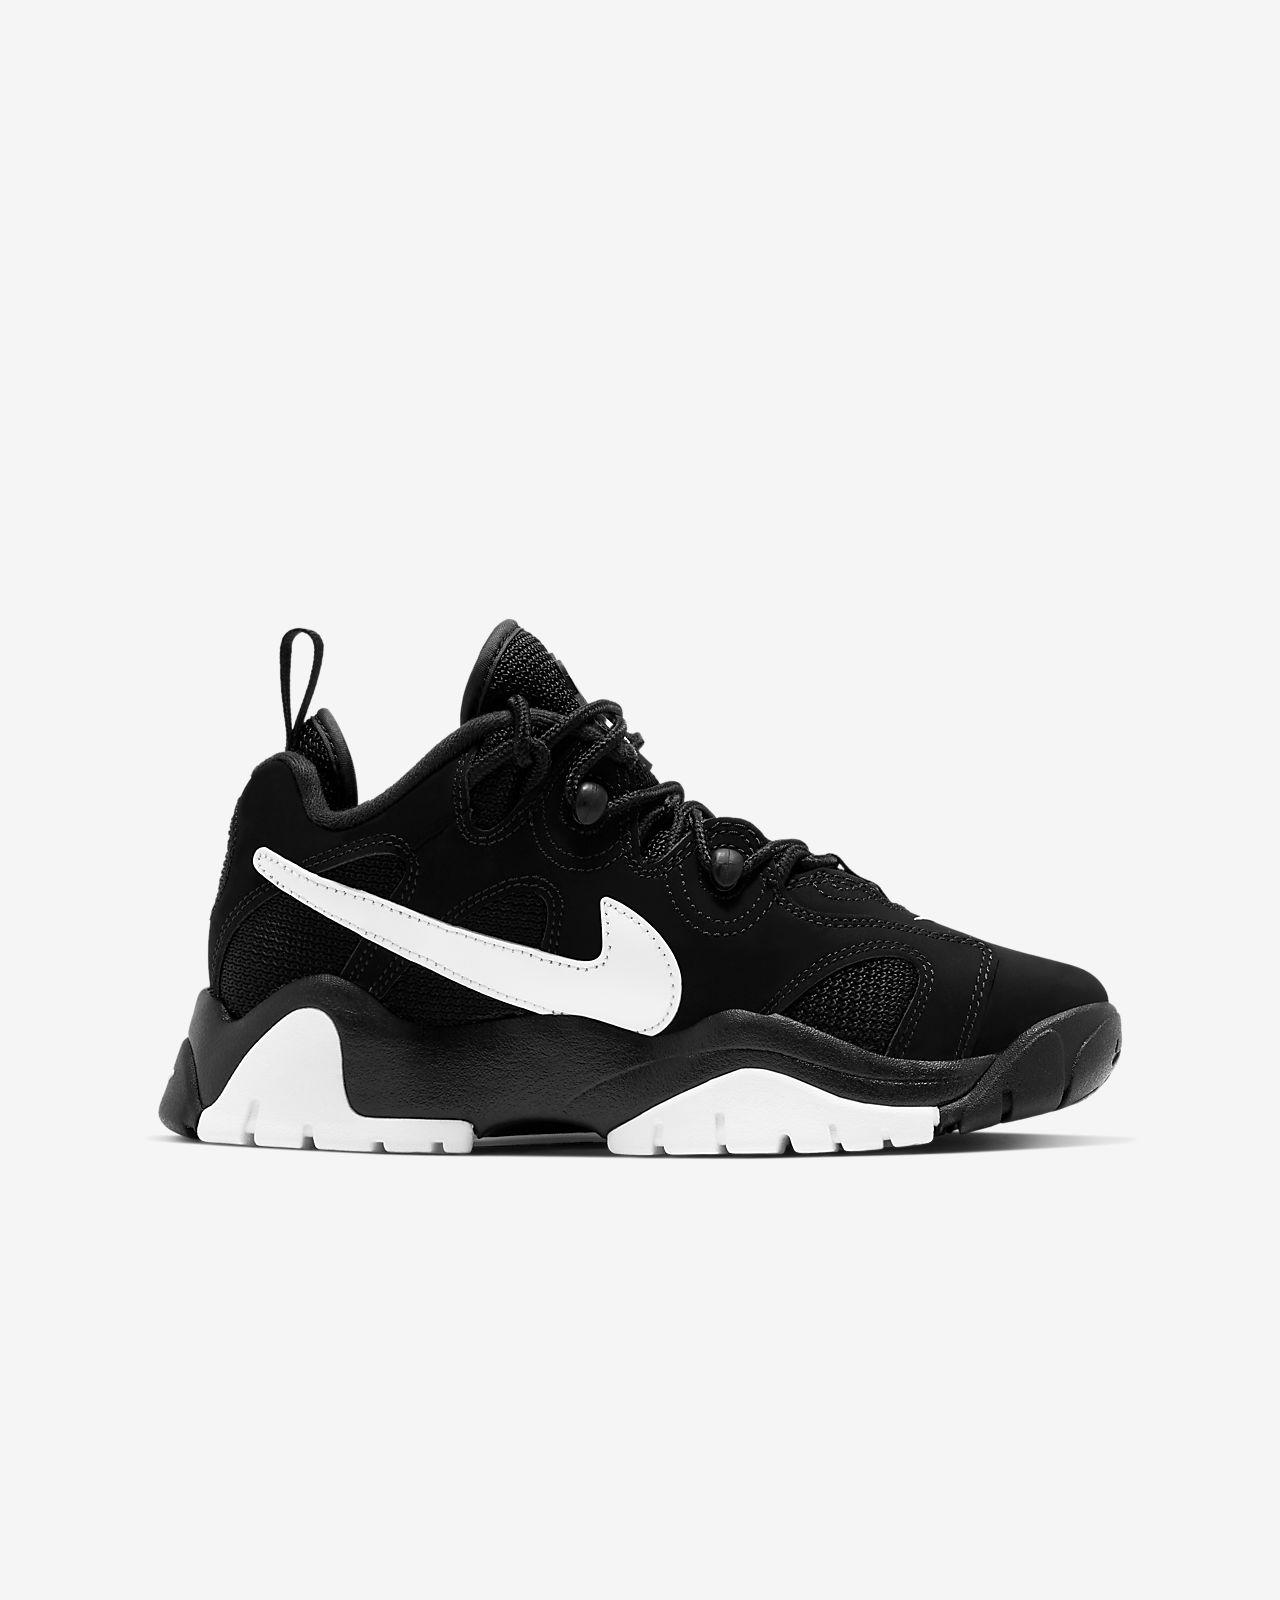 Nike Air Barrage Low Older Kids' Shoe